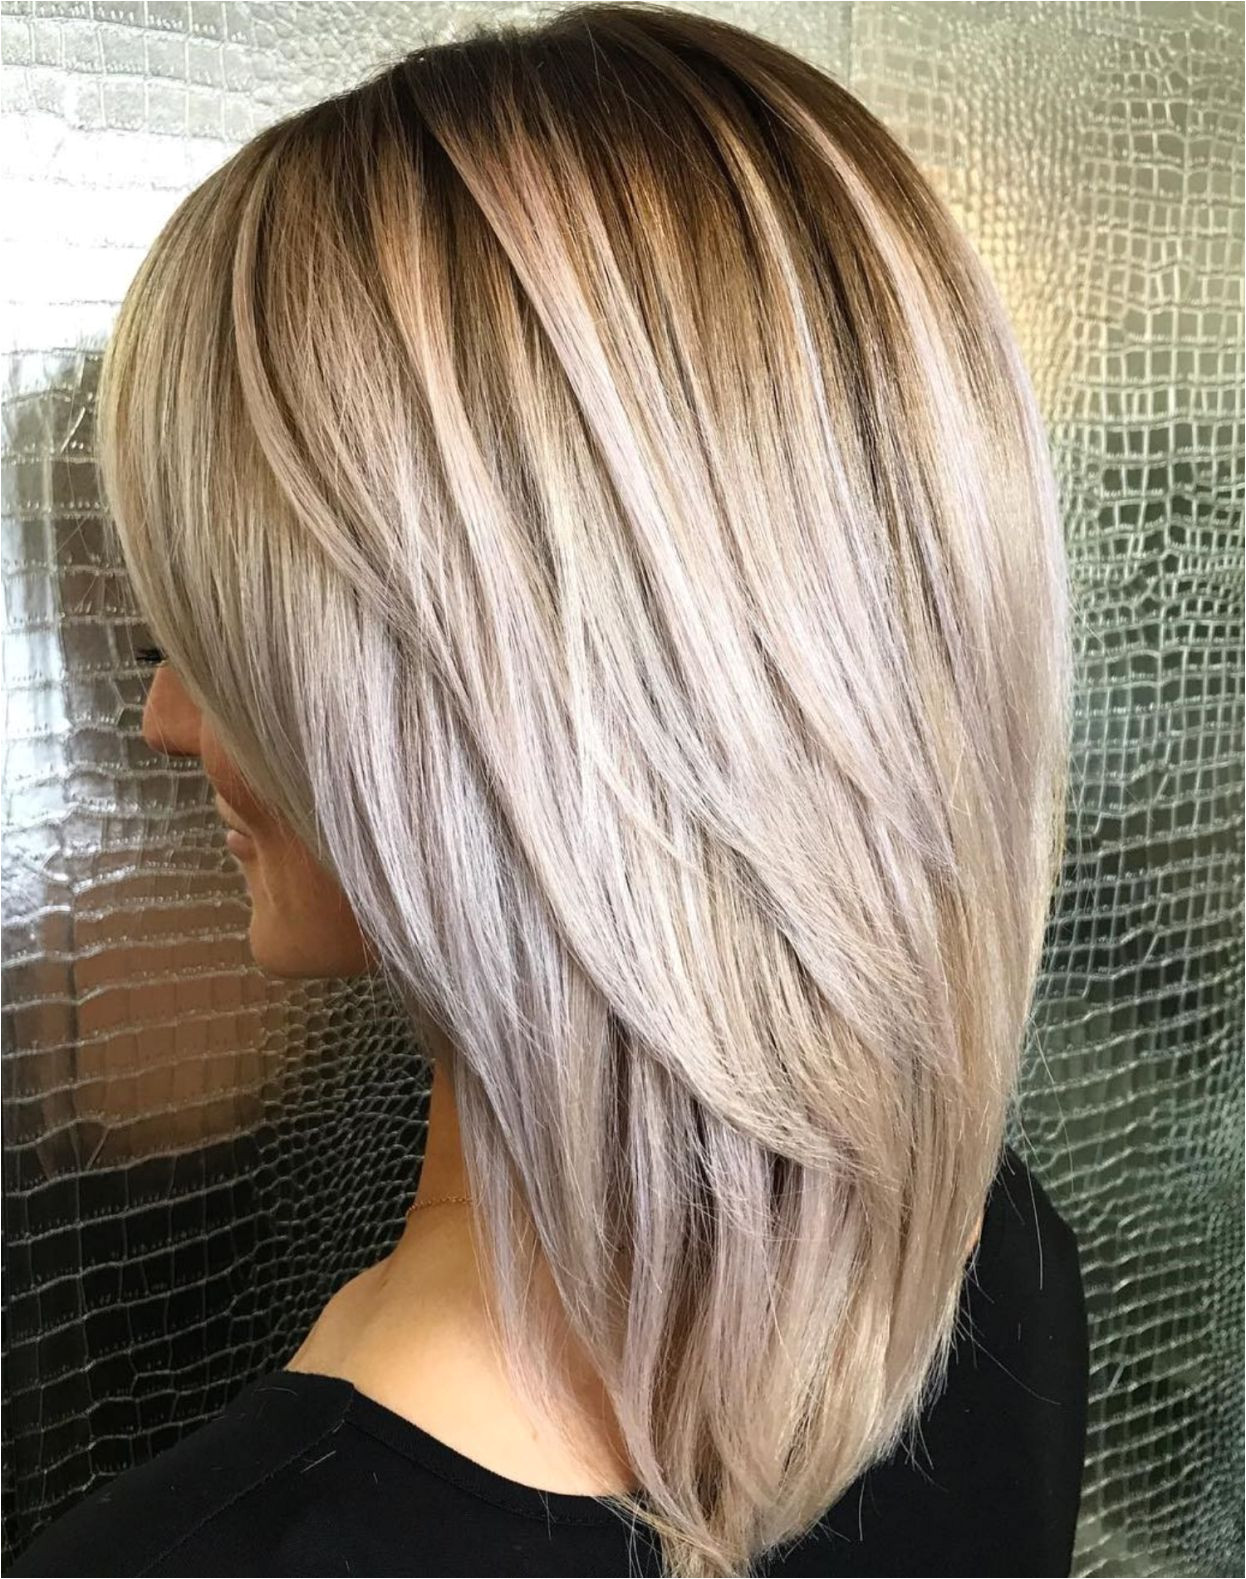 Medium Haircut With Long V Cut Layers